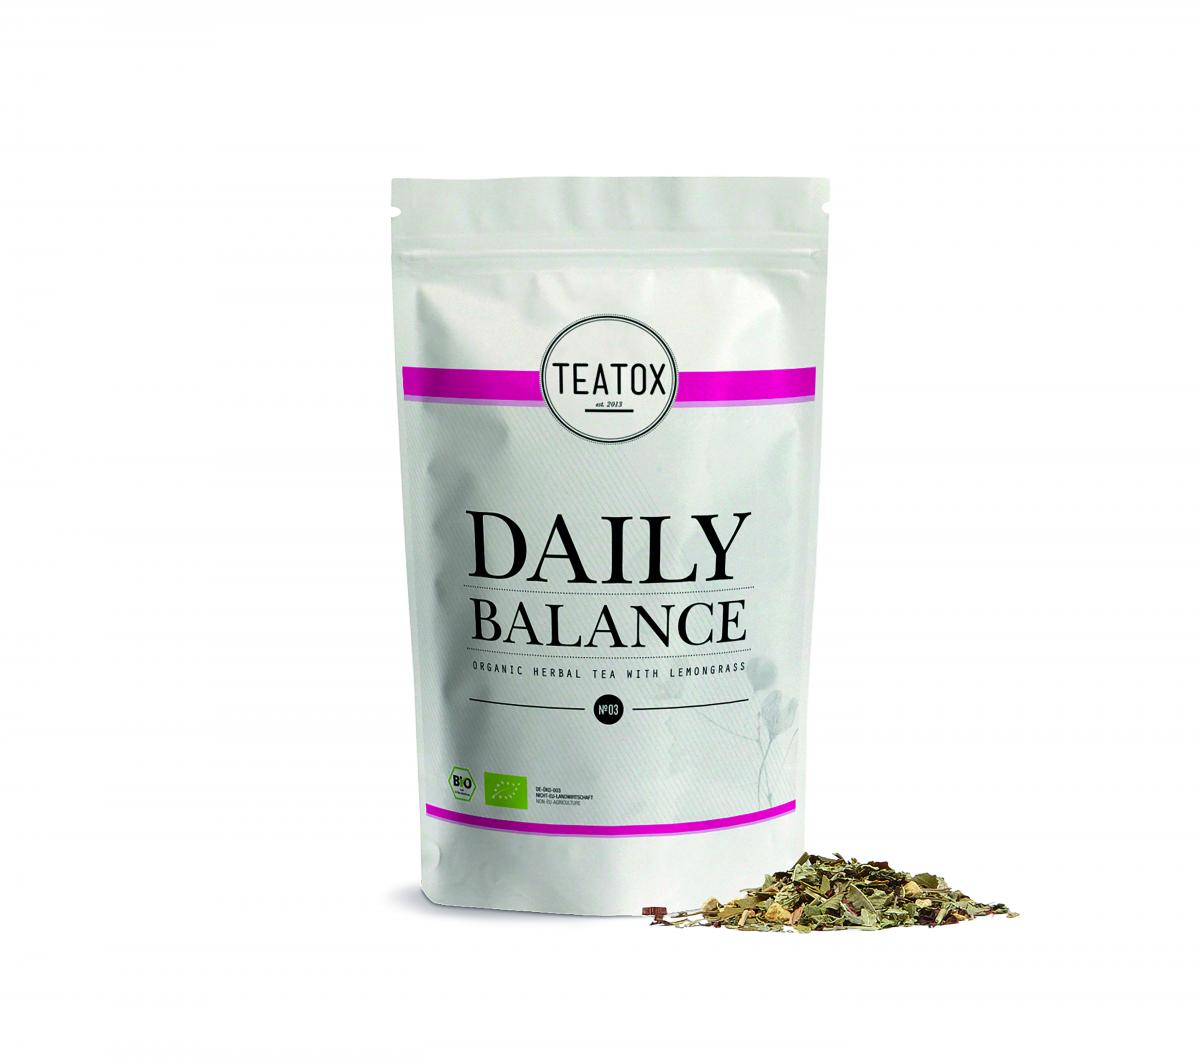 Daily Balance 50g, utántöltő